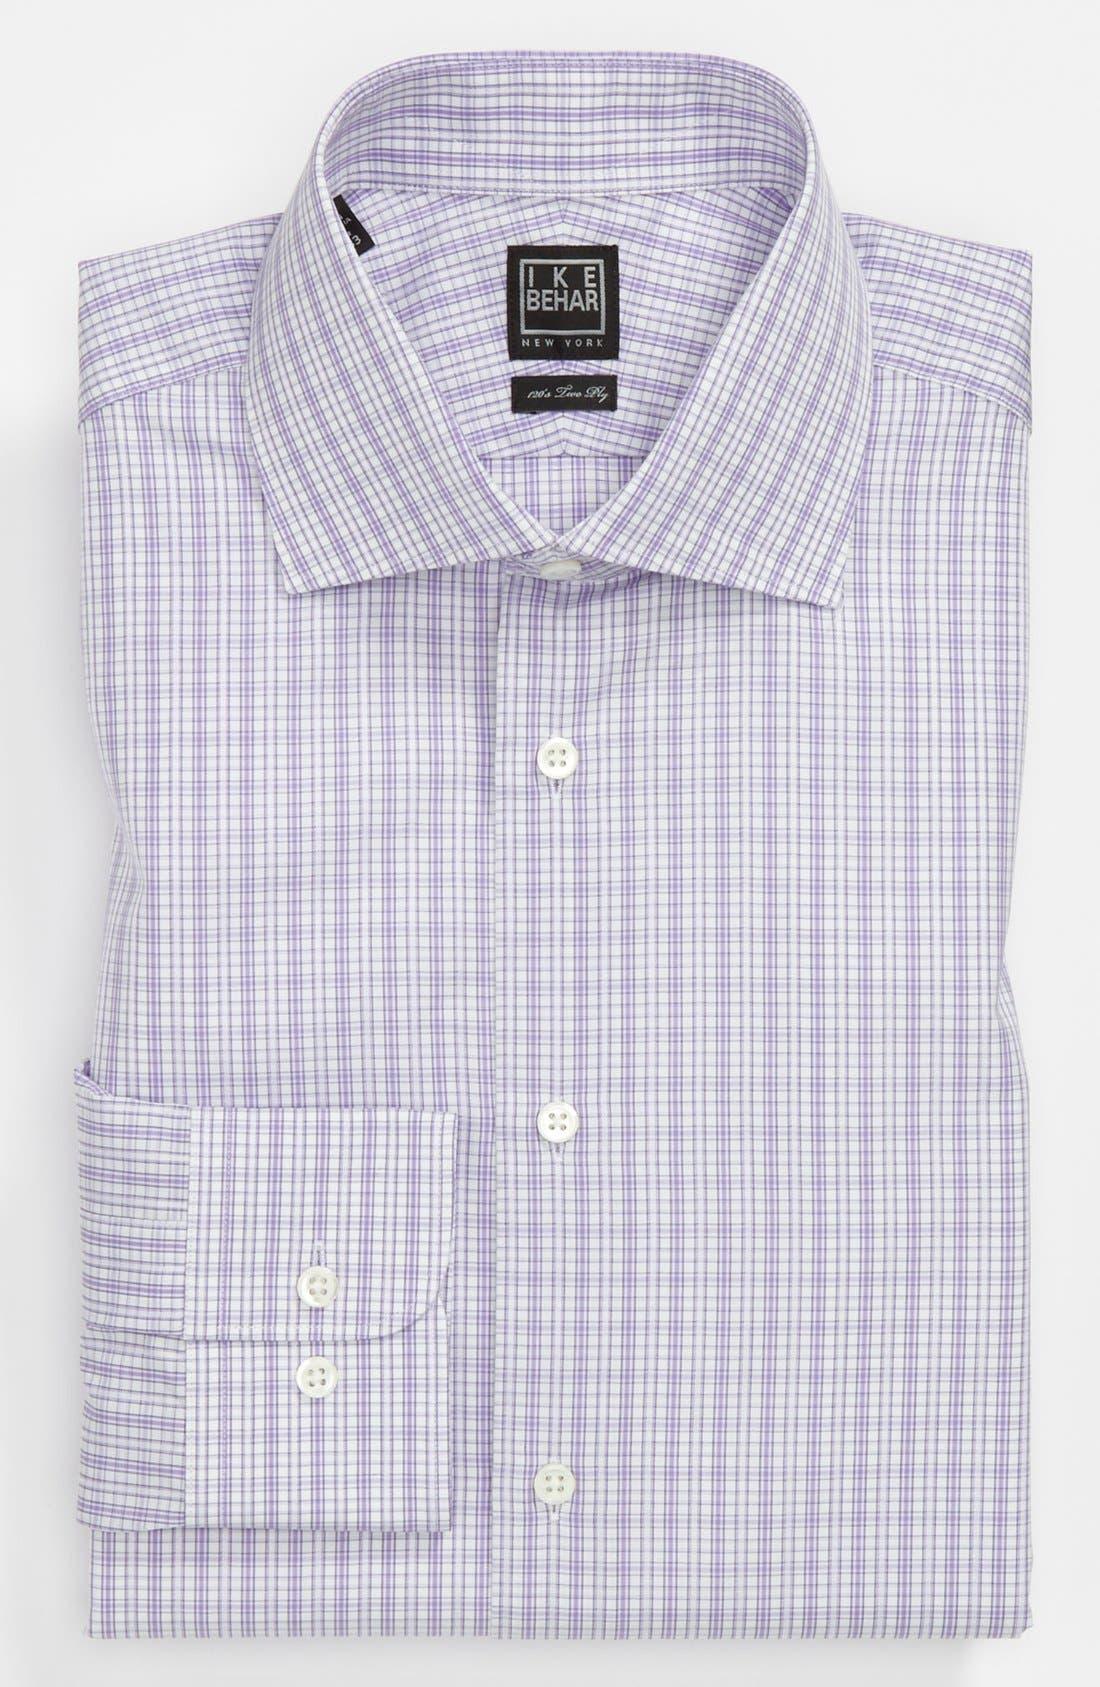 Main Image - Ike Behar Regular Fit Dress Shirt